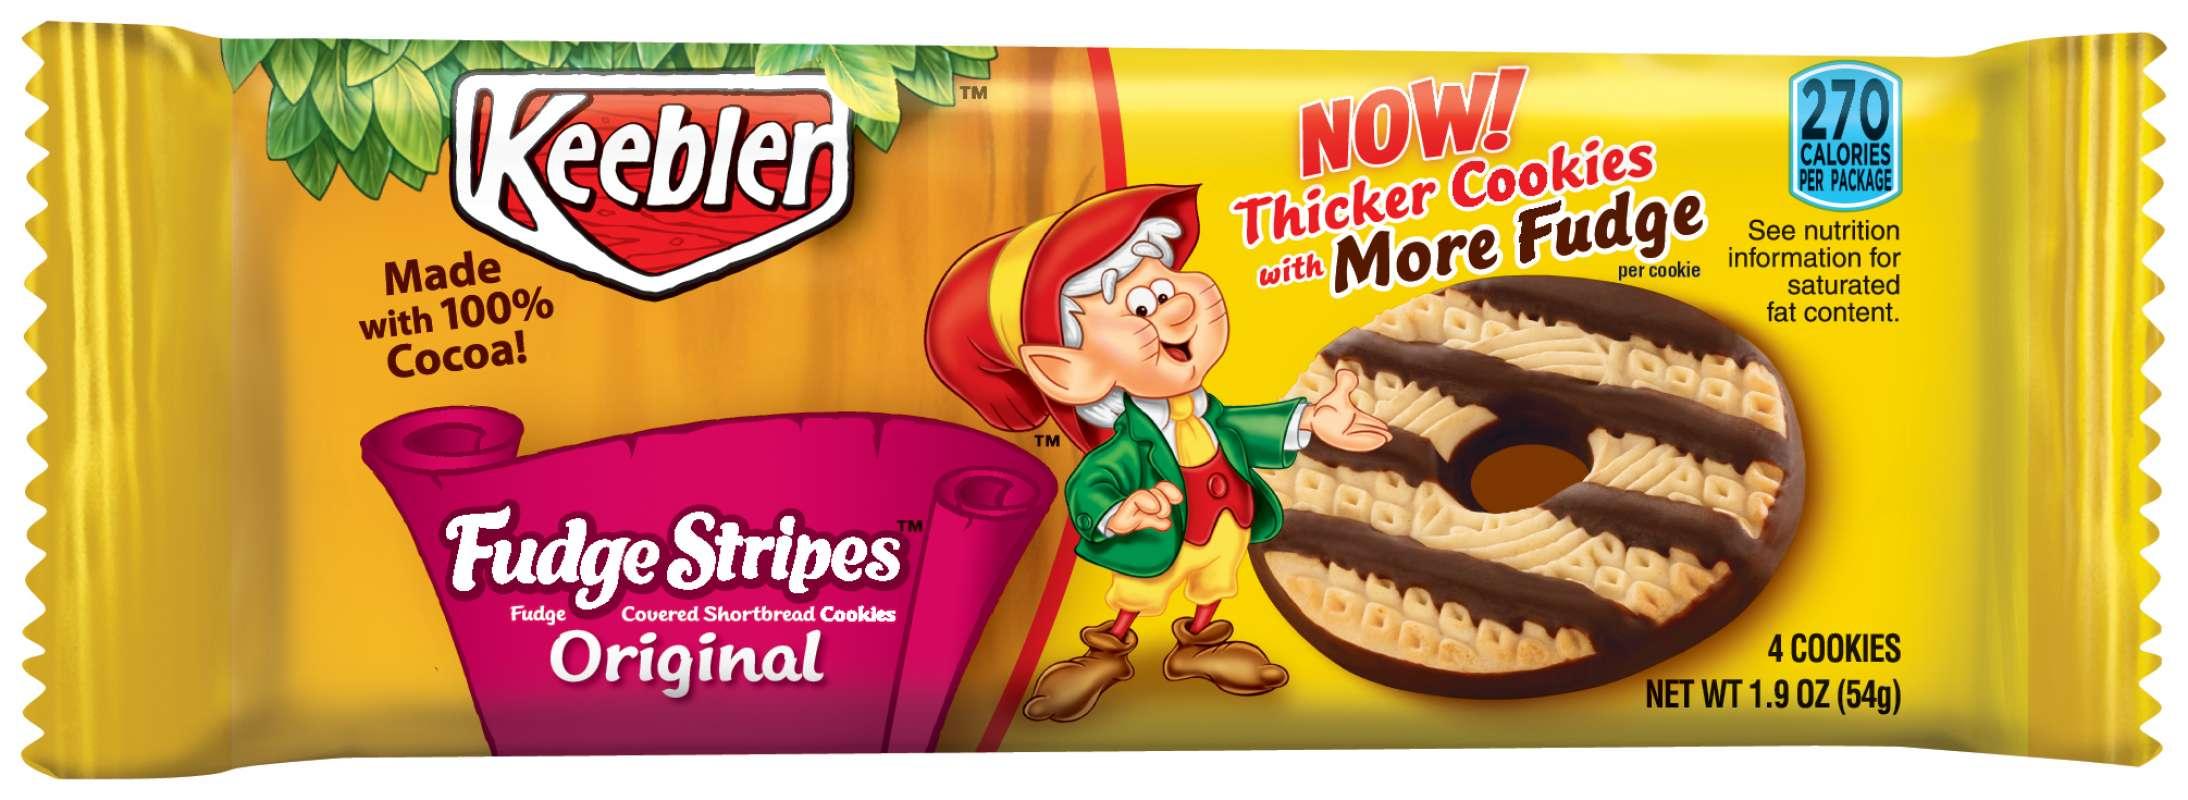 keebler cookies coupon 100 off 2 keebler cookies